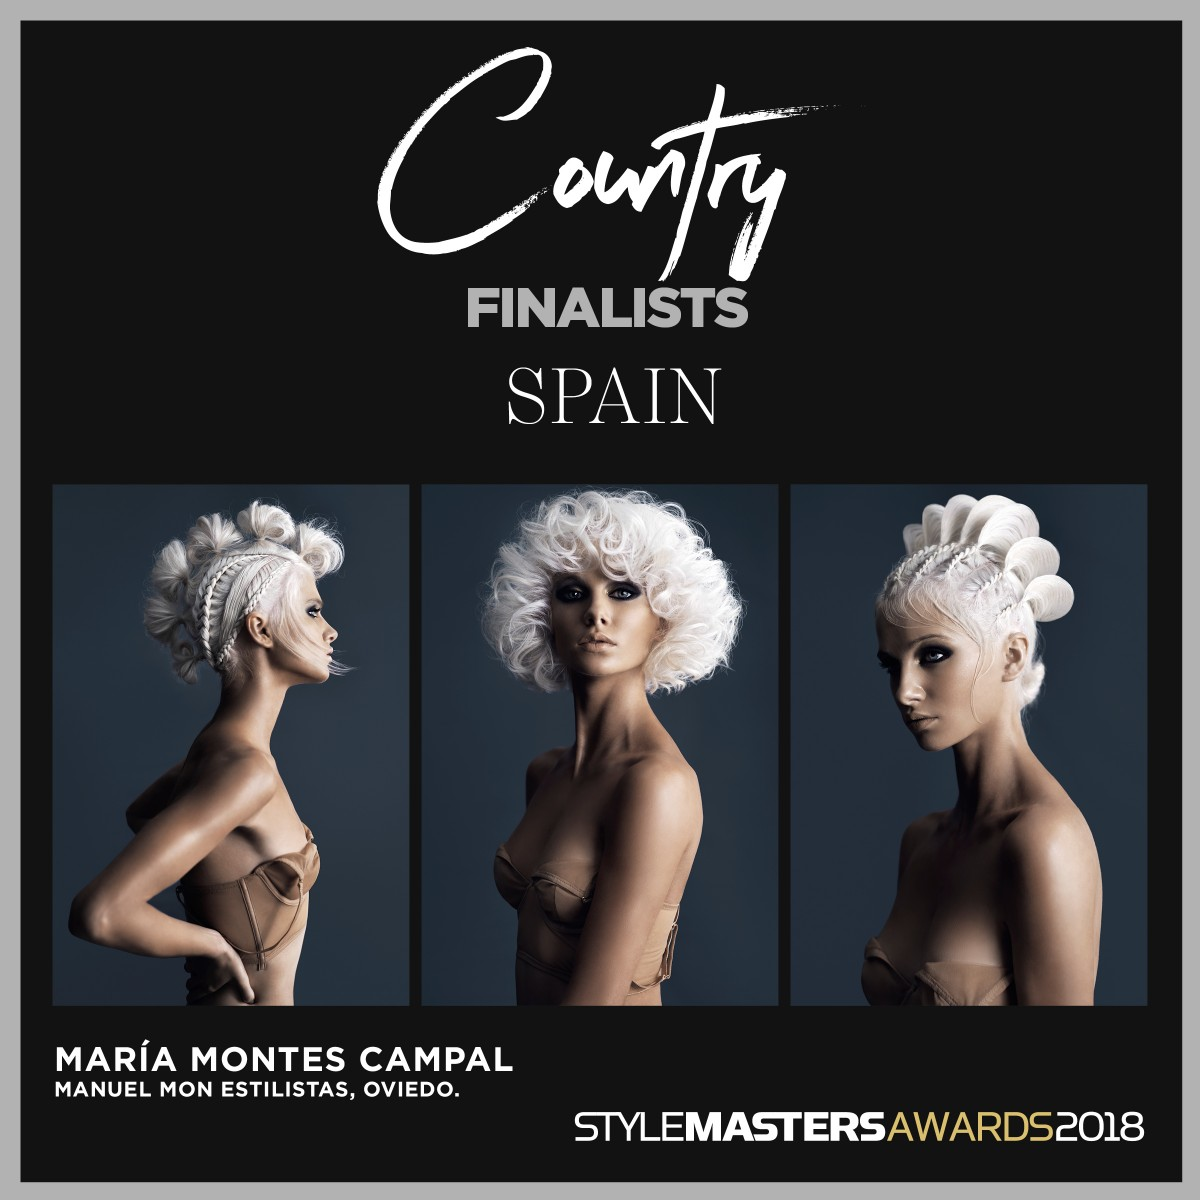 SM_AWARDS2018_Post-Finalista-MARIA MONTES